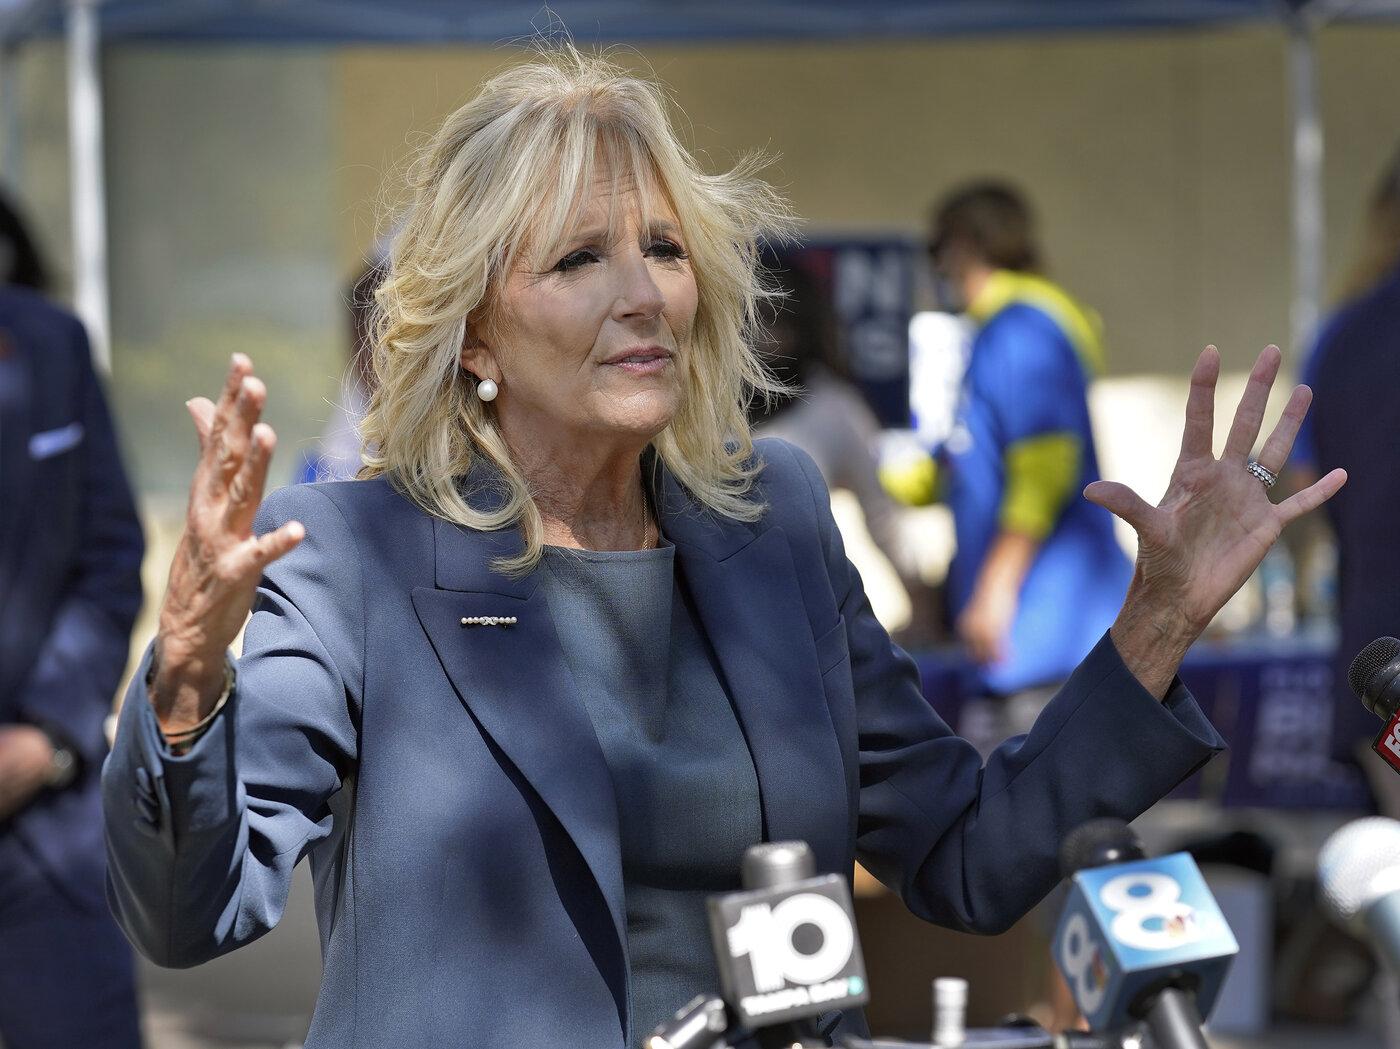 Op-Ed Urging Jill Biden To Drop The 'Dr.' Sparks Outrage Online